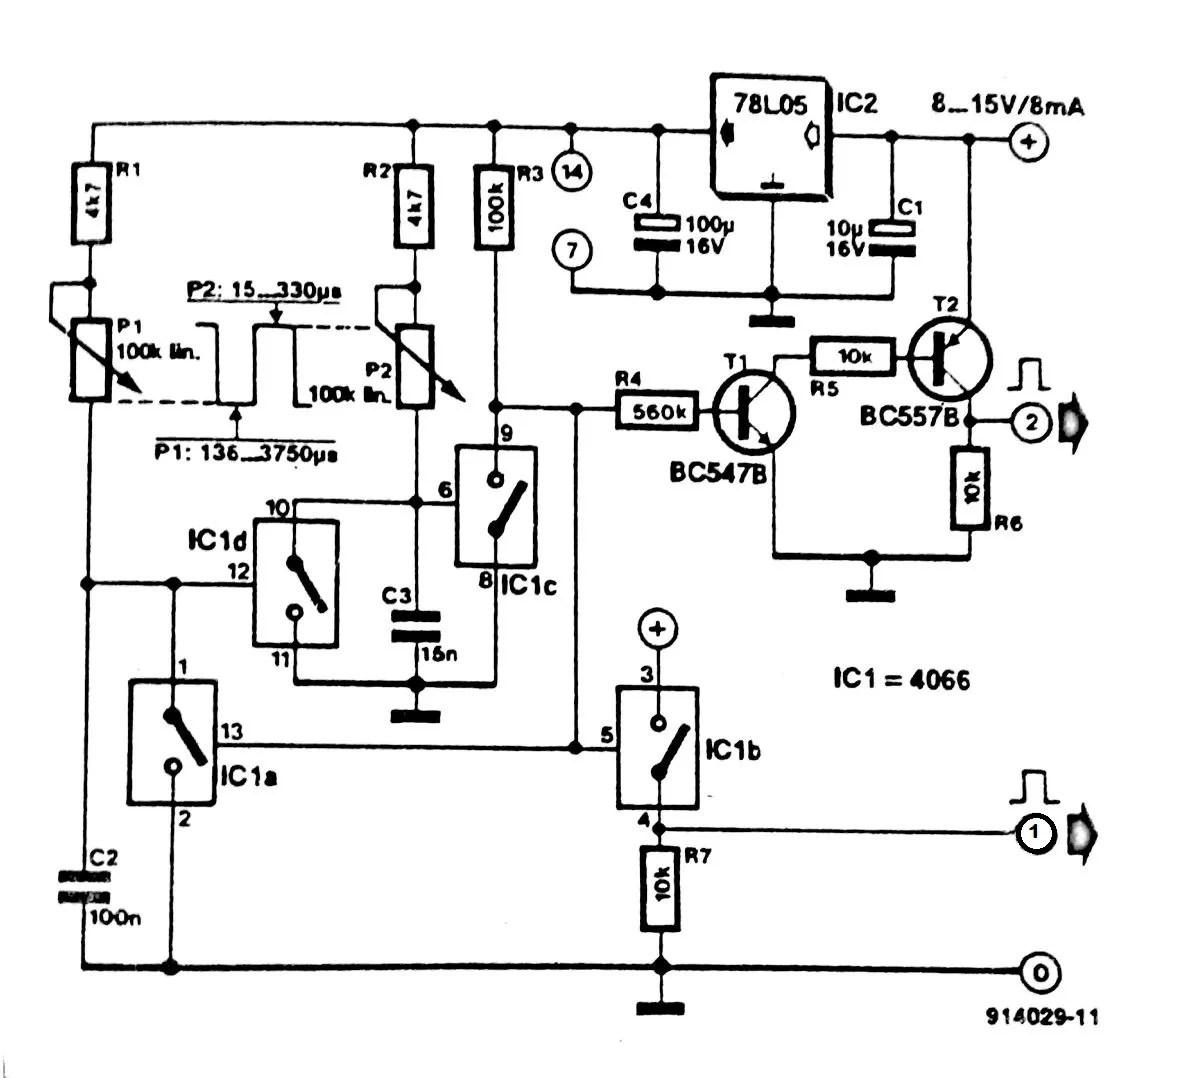 hight resolution of john deere 500c wiring diagram best wiring libraryjohn deere 500c wiring diagram